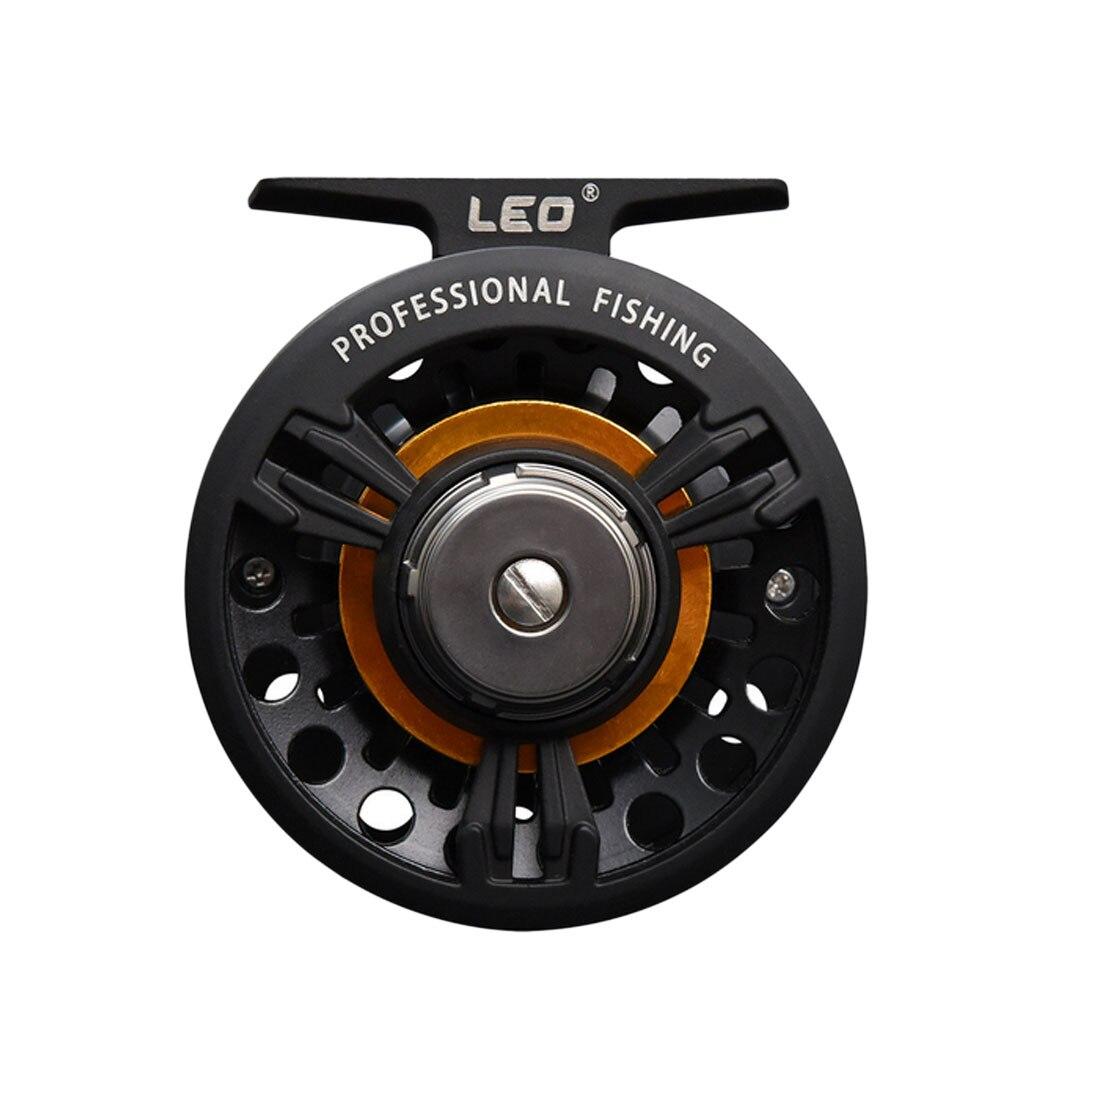 Interchangeable Full Metal Fly Fish Reel Fishing Wheel Carp LEO Left Right Former Rafting Ice Fishing Wheel